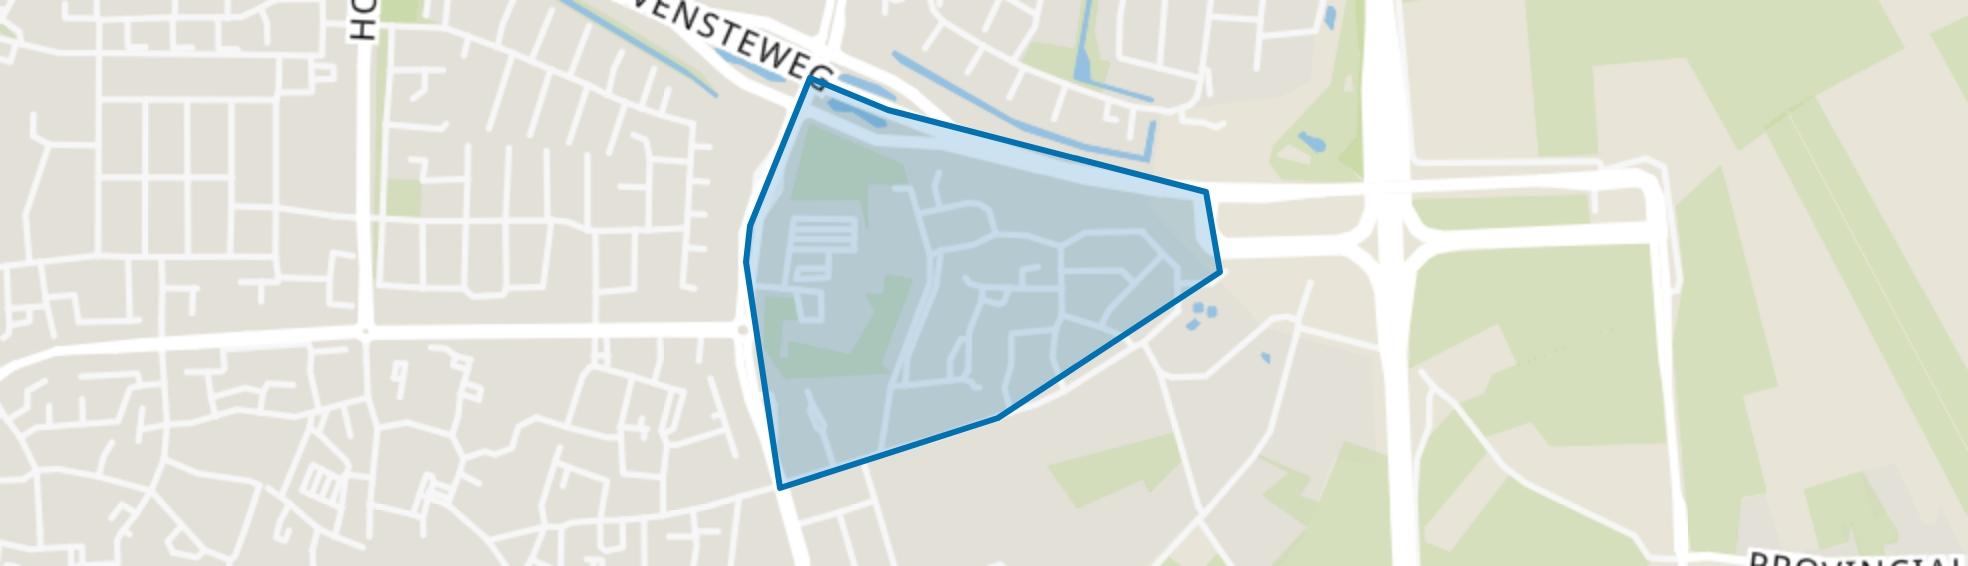 Molenbuurt, Oosterhout (NB) map